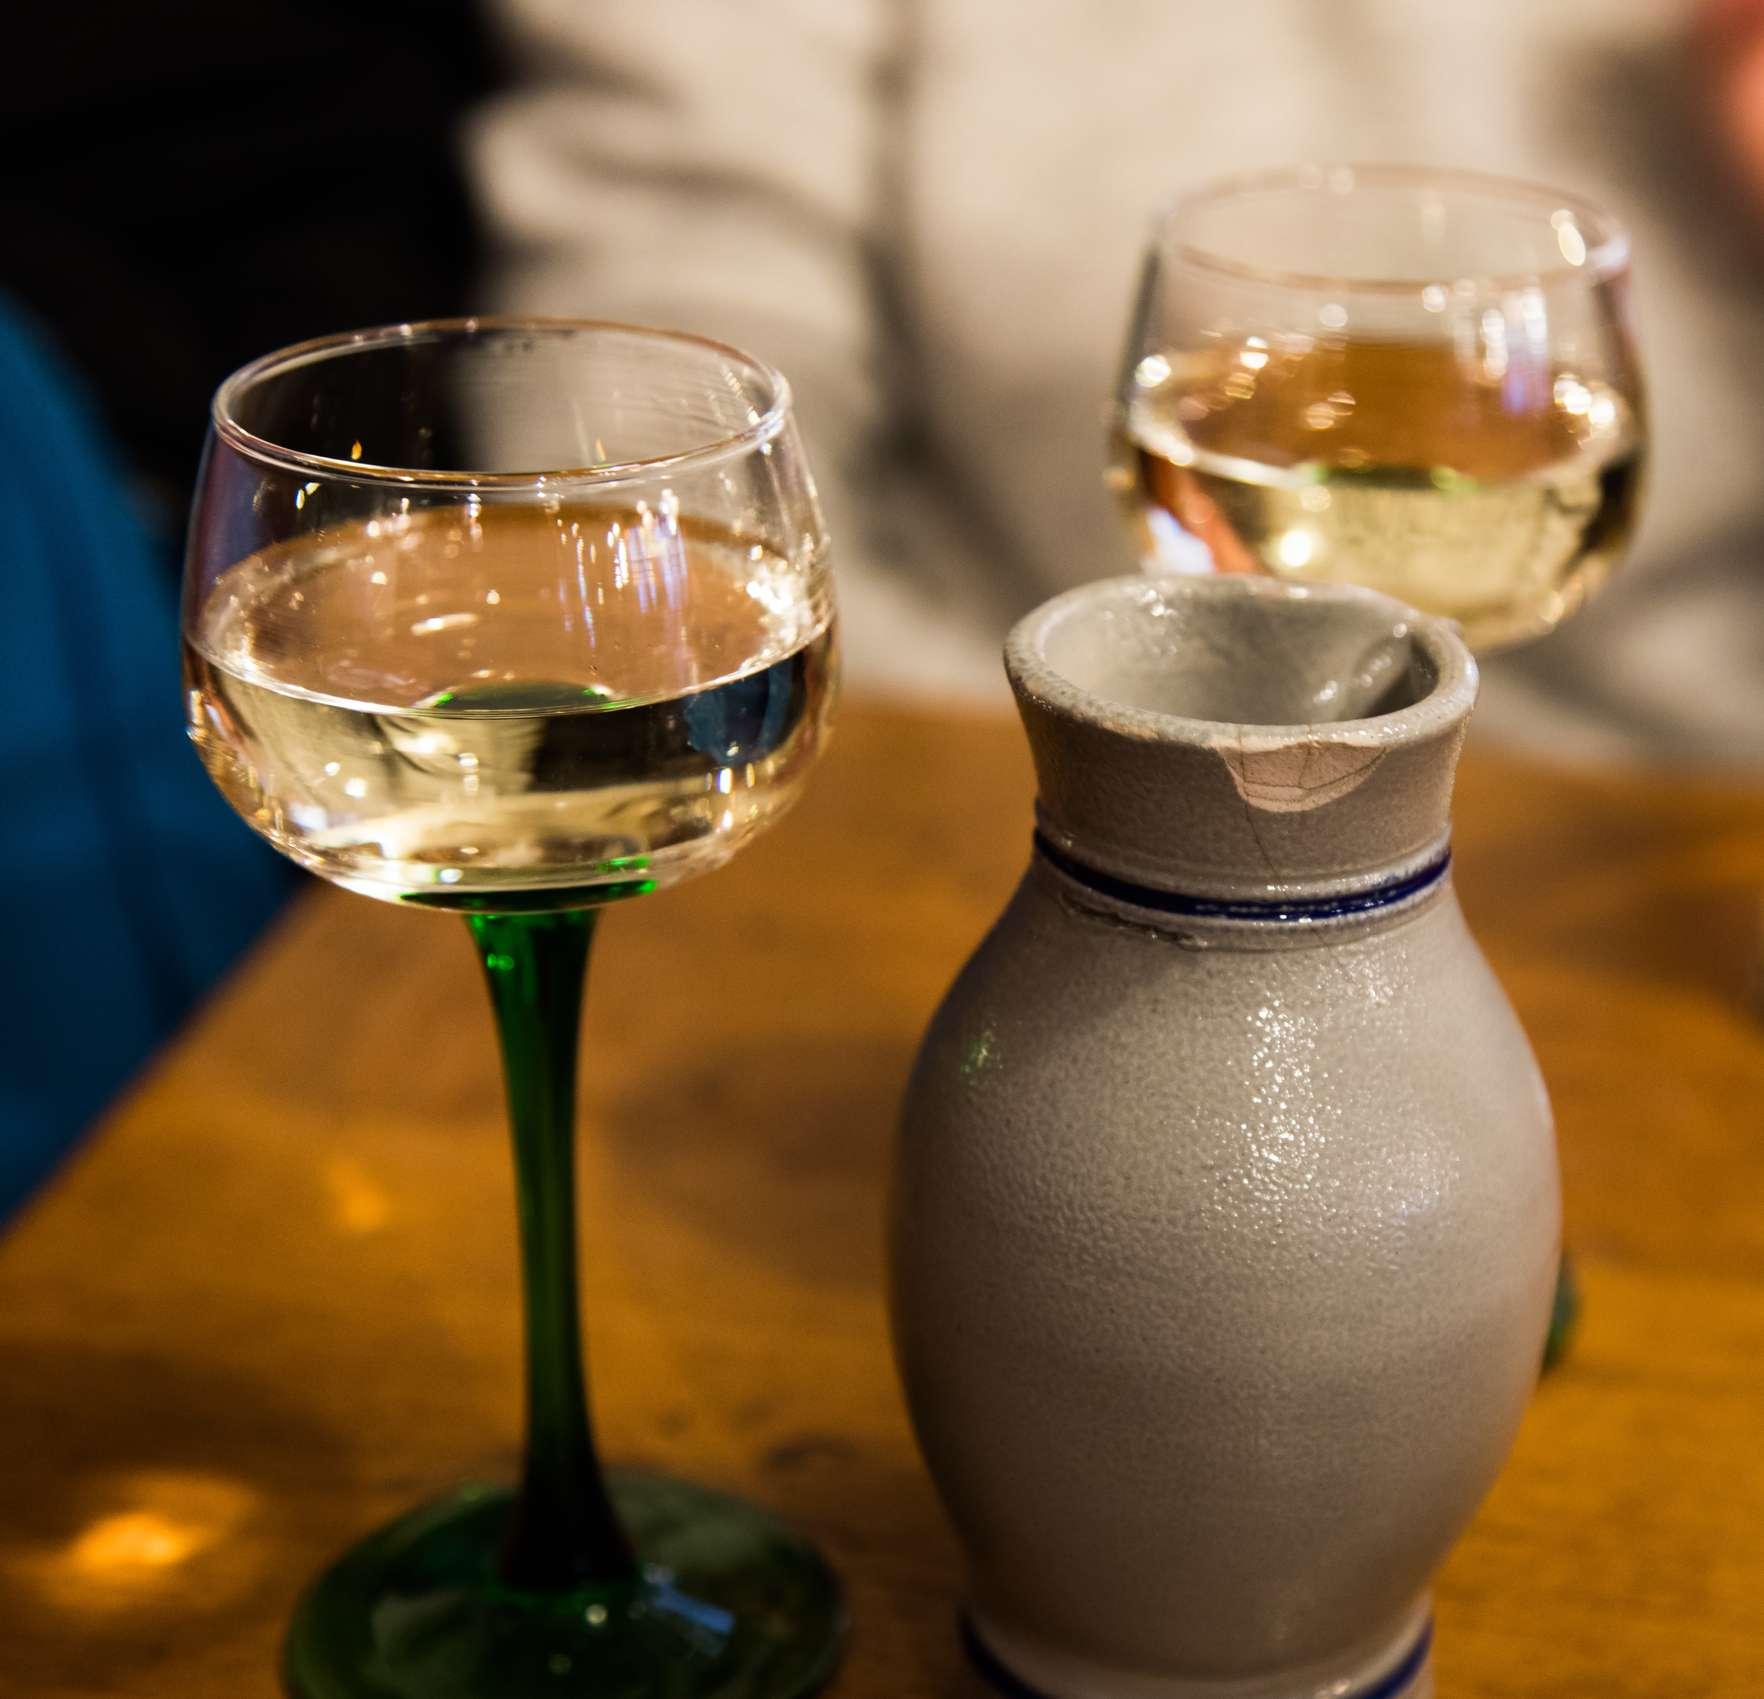 White wine in traditional Alsatian-style wine glasses